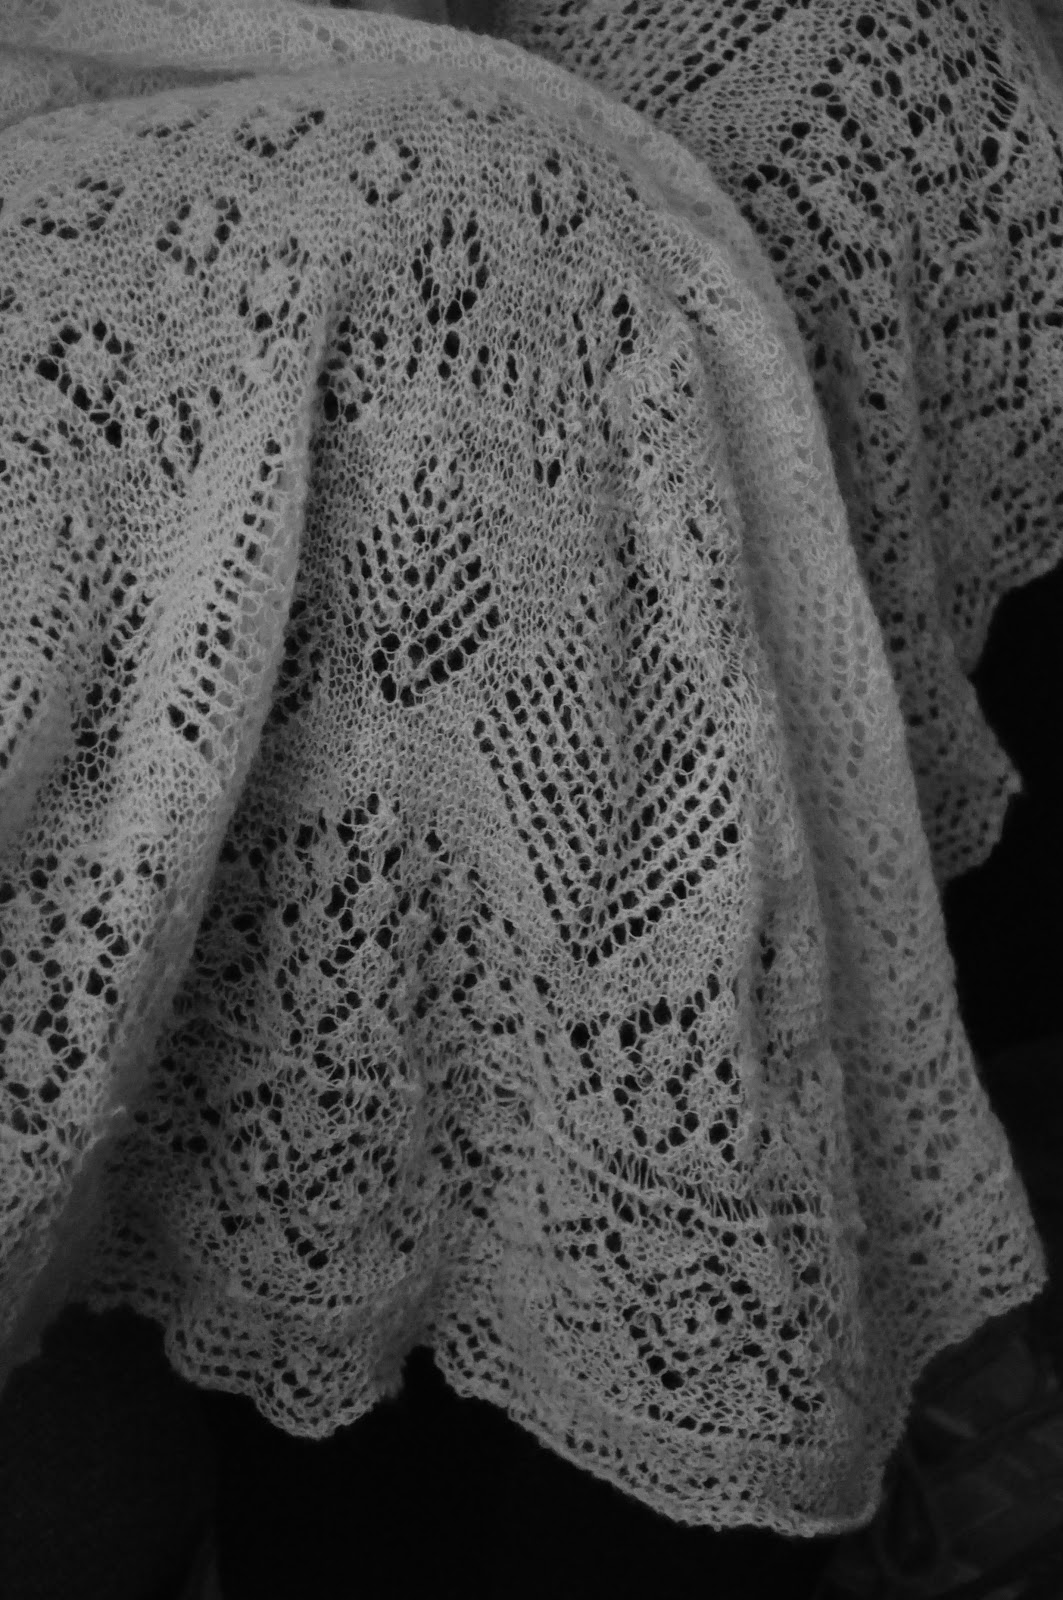 Vintage Sally Sheltland Lace Knitting Heirloom